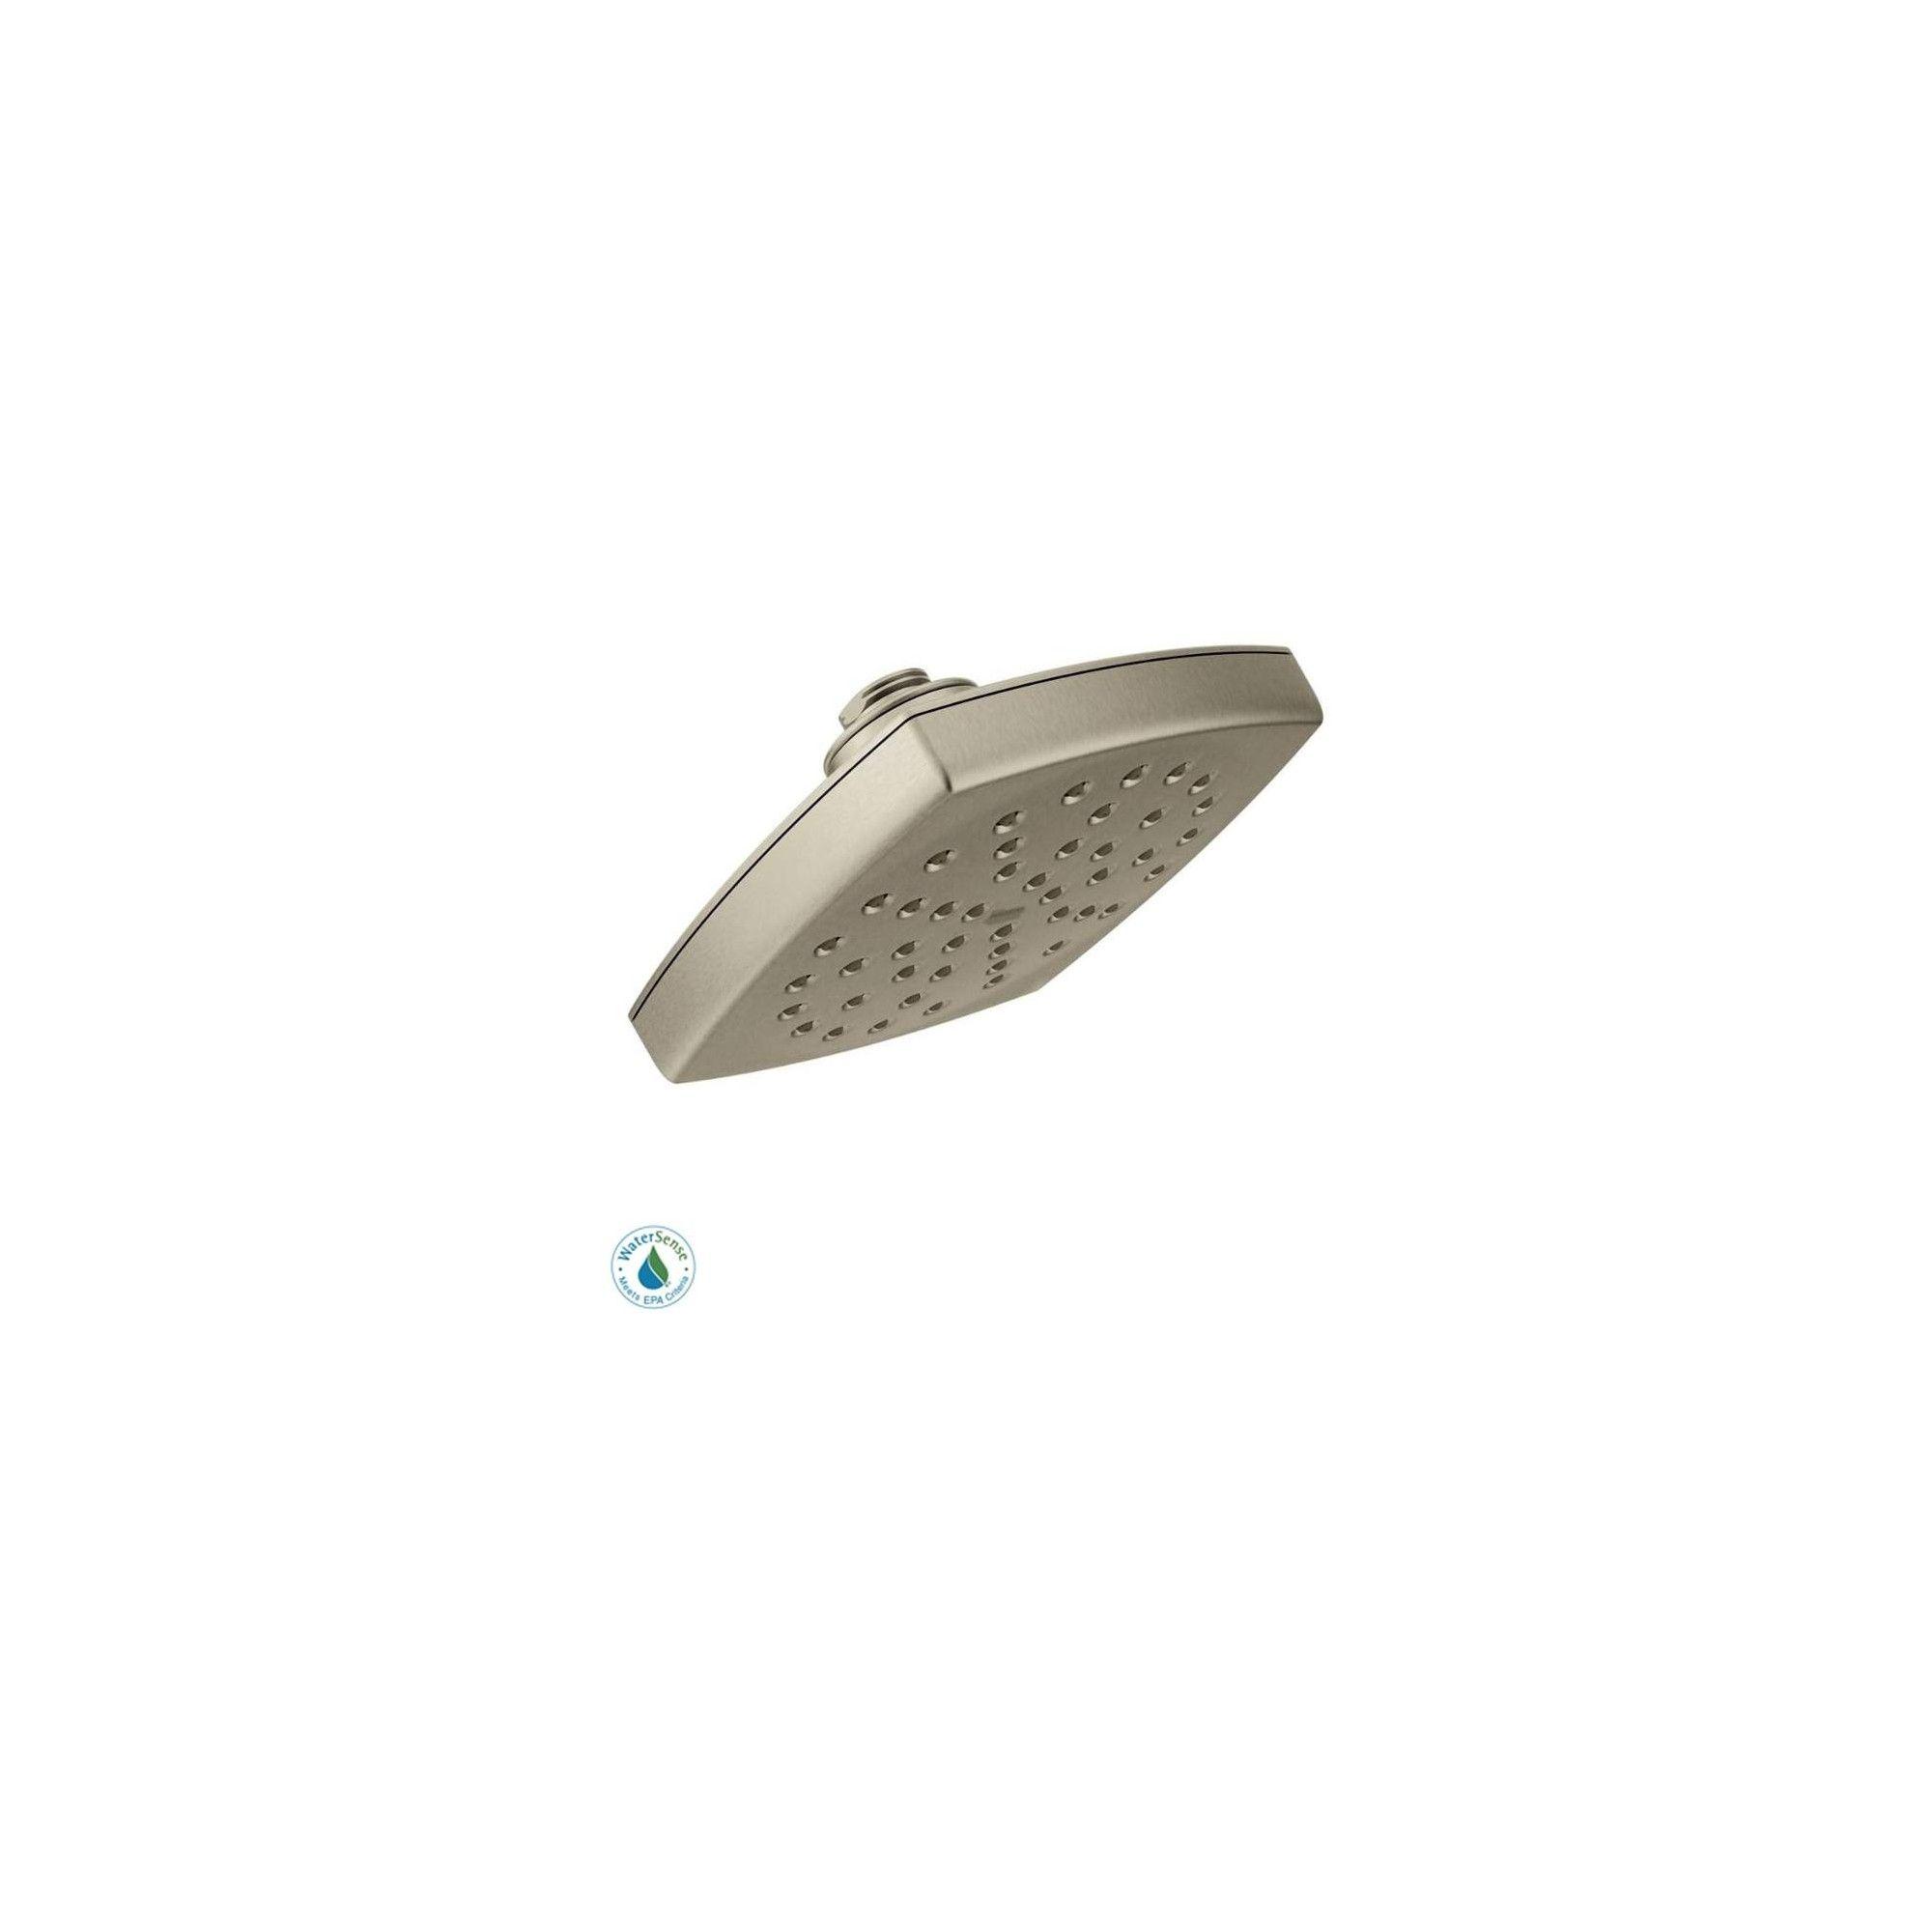 Moen S6365ep Voss 6 Single Function Shower Head Brushed Nickel